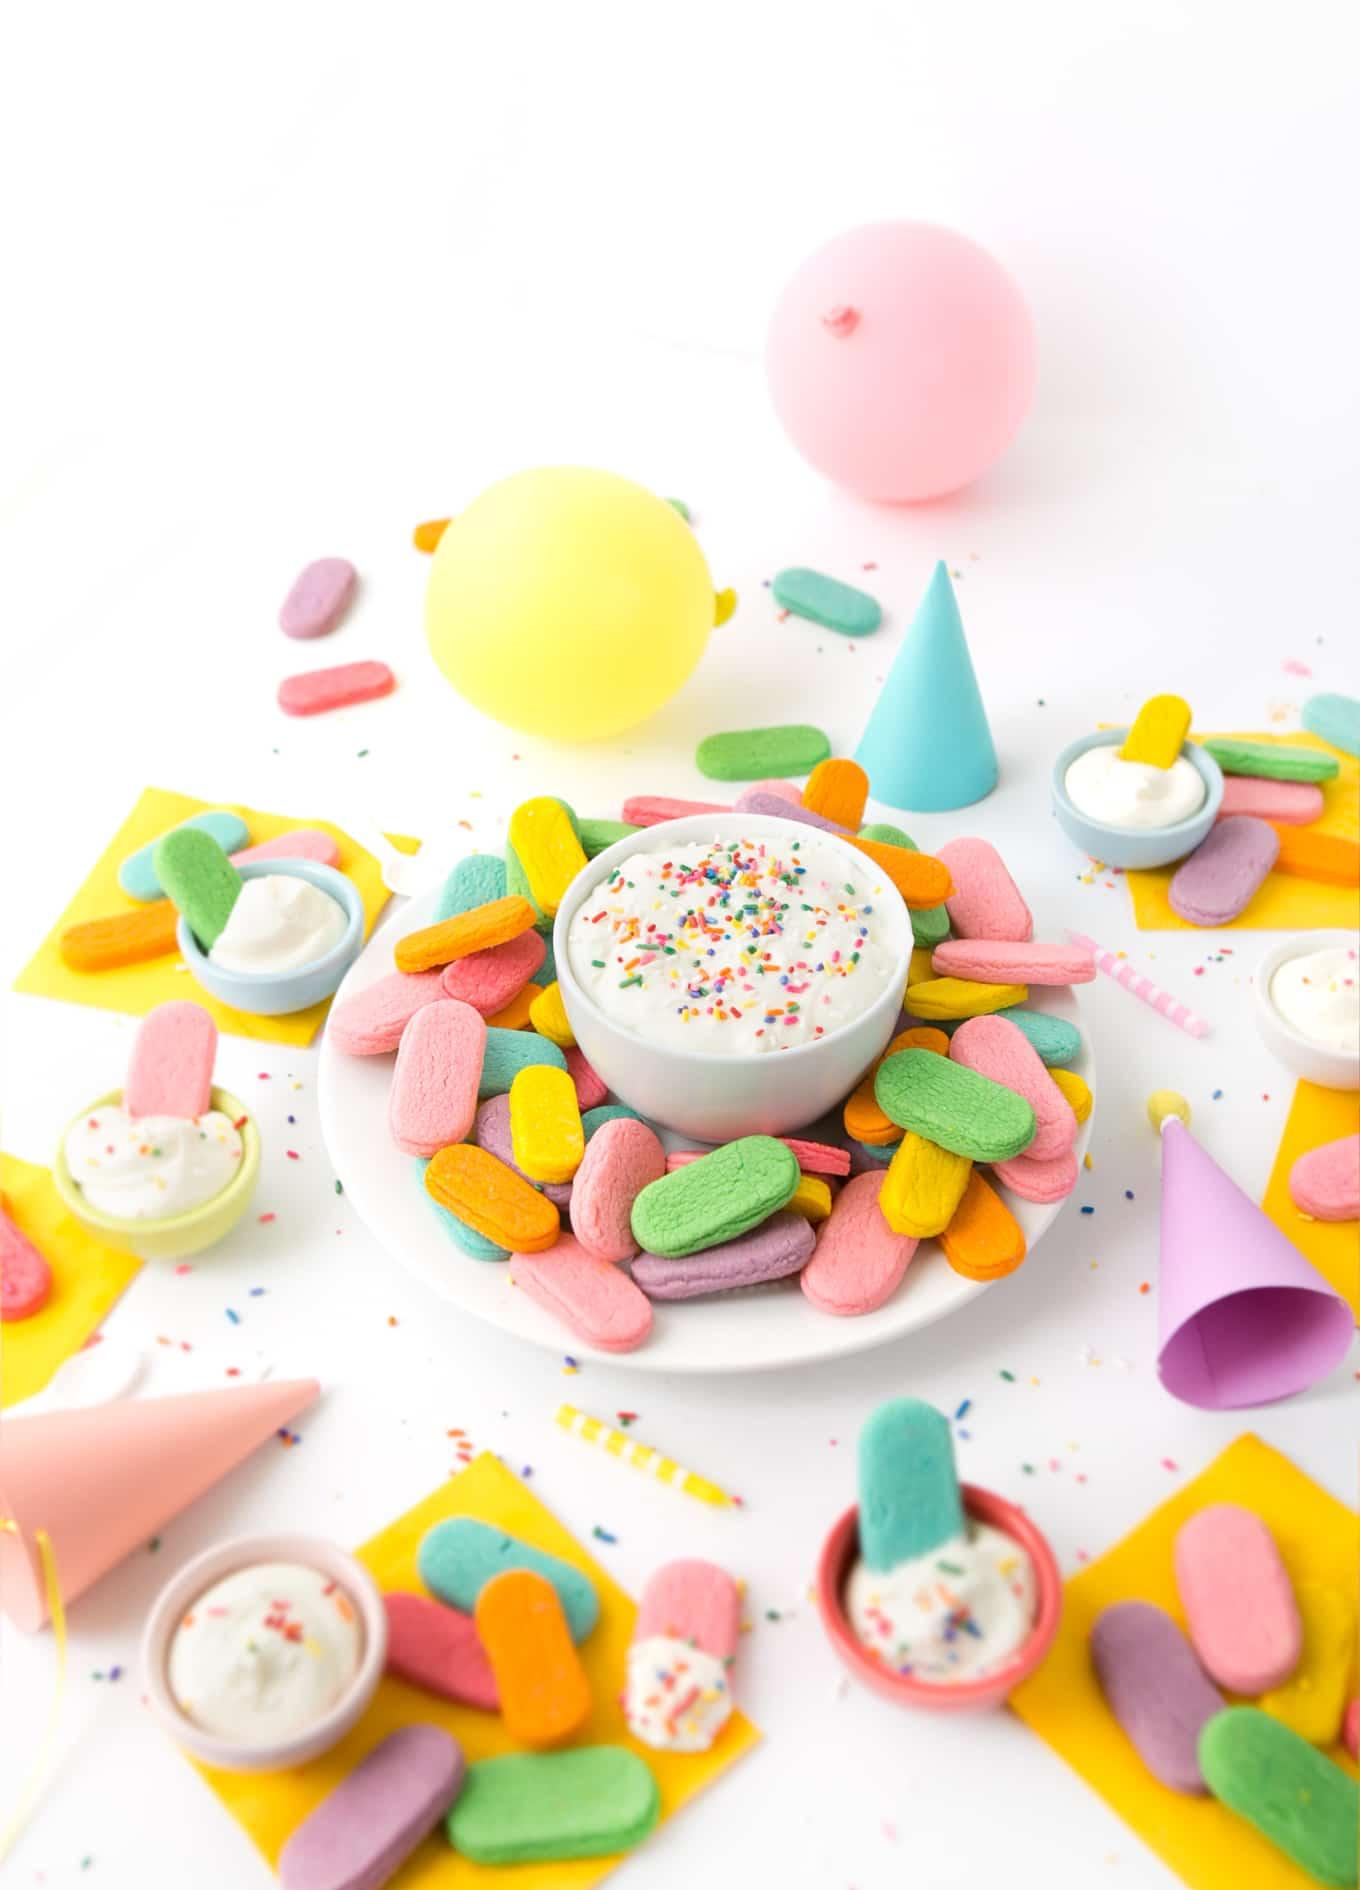 OMG. Sugar cookies shaped like SPRINKLES! Make these sugar cookie dippers as the perfect birthday party treat! | www.DesignEatRepeat.com | #sprinkles #sugarcookie